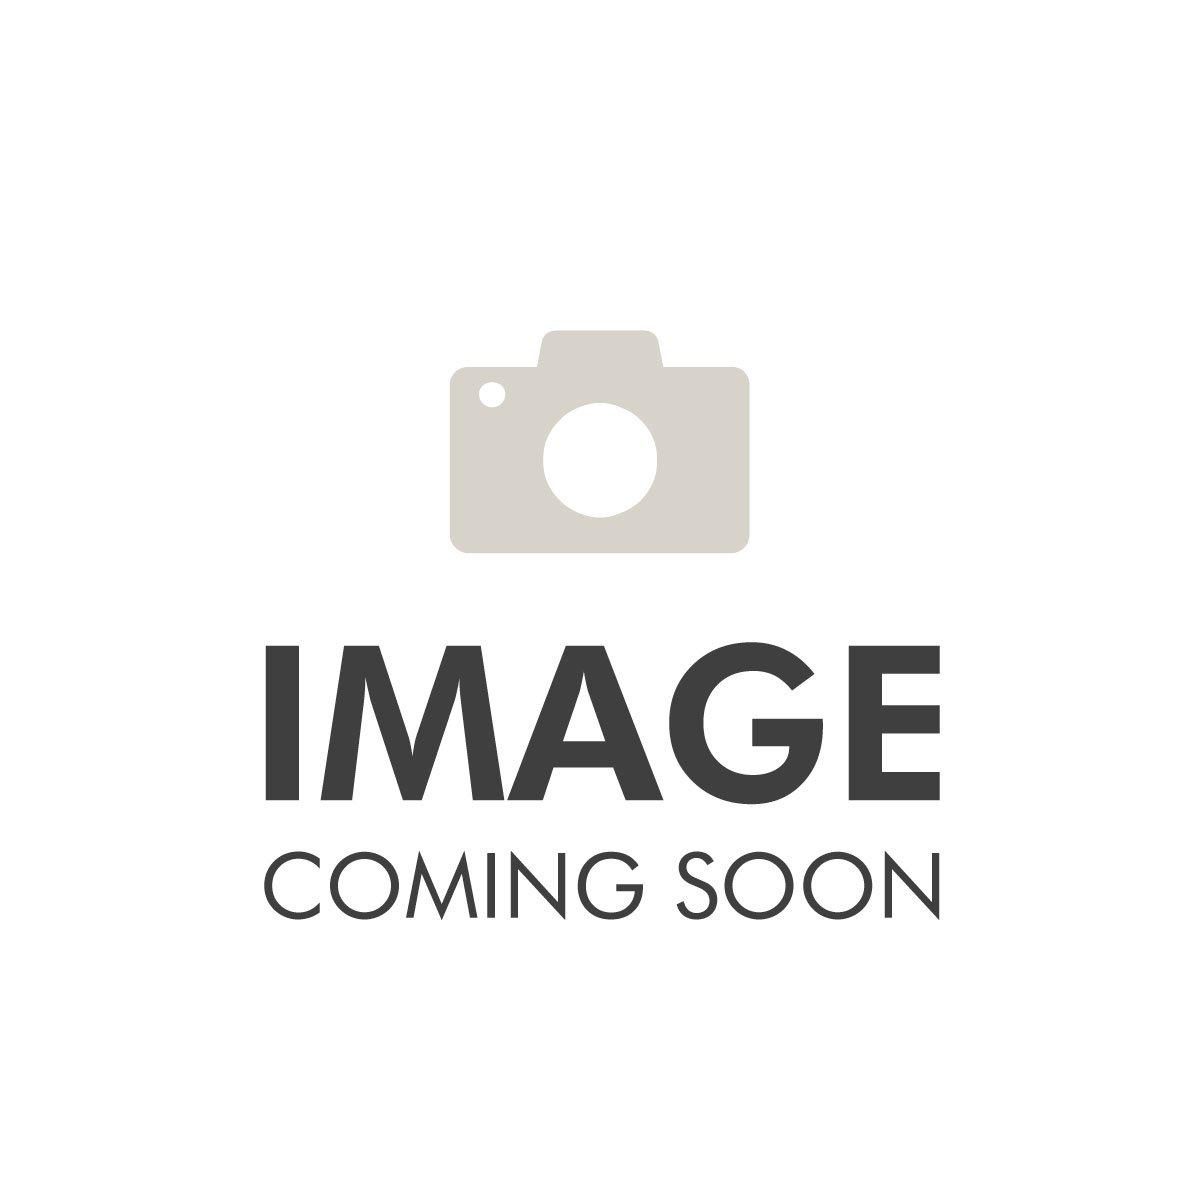 L'Oreal Loreal Color Riche Quads Eyeshadow E8 Bleu Mariniere